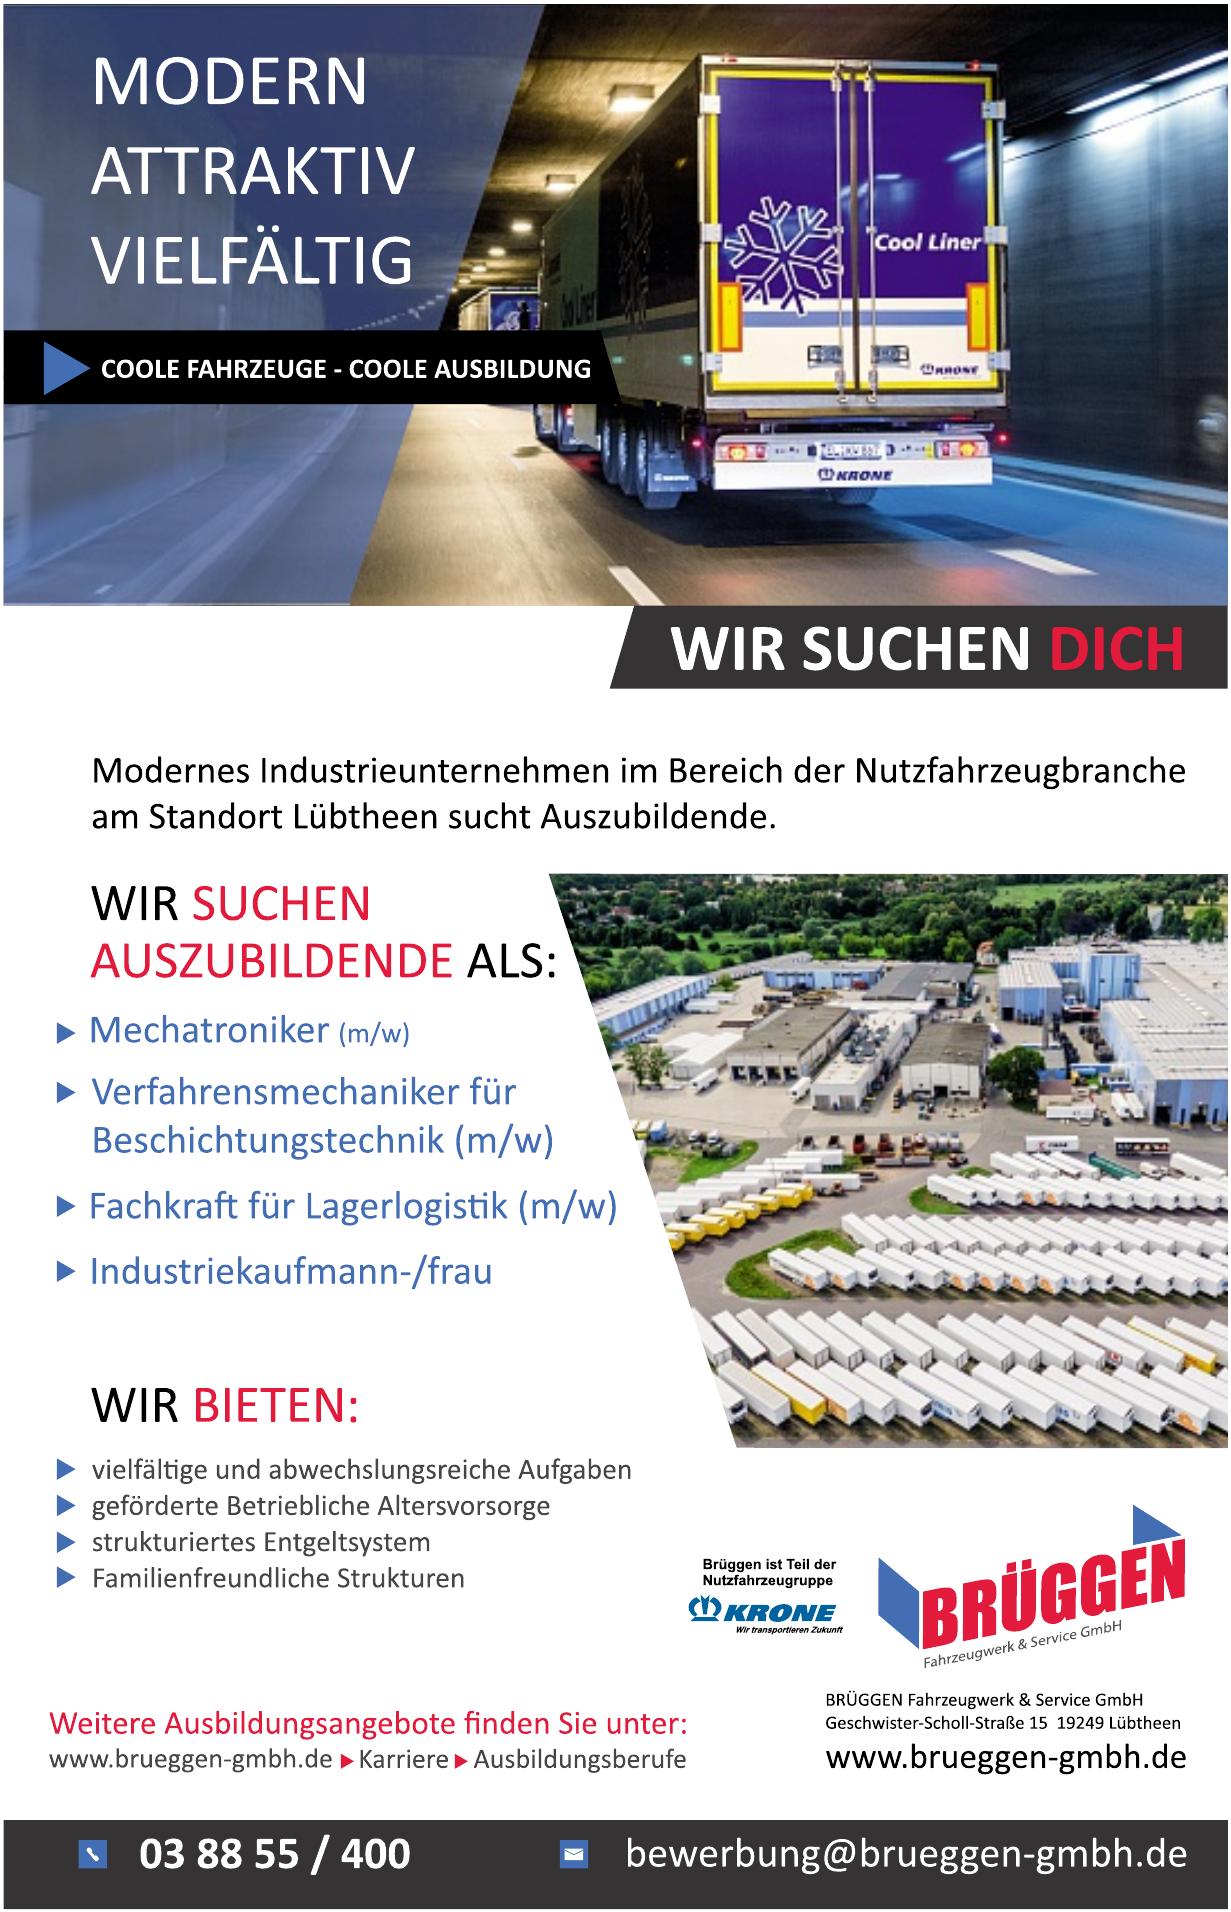 Brüggen Fahrzeugwerk & Service GmbH